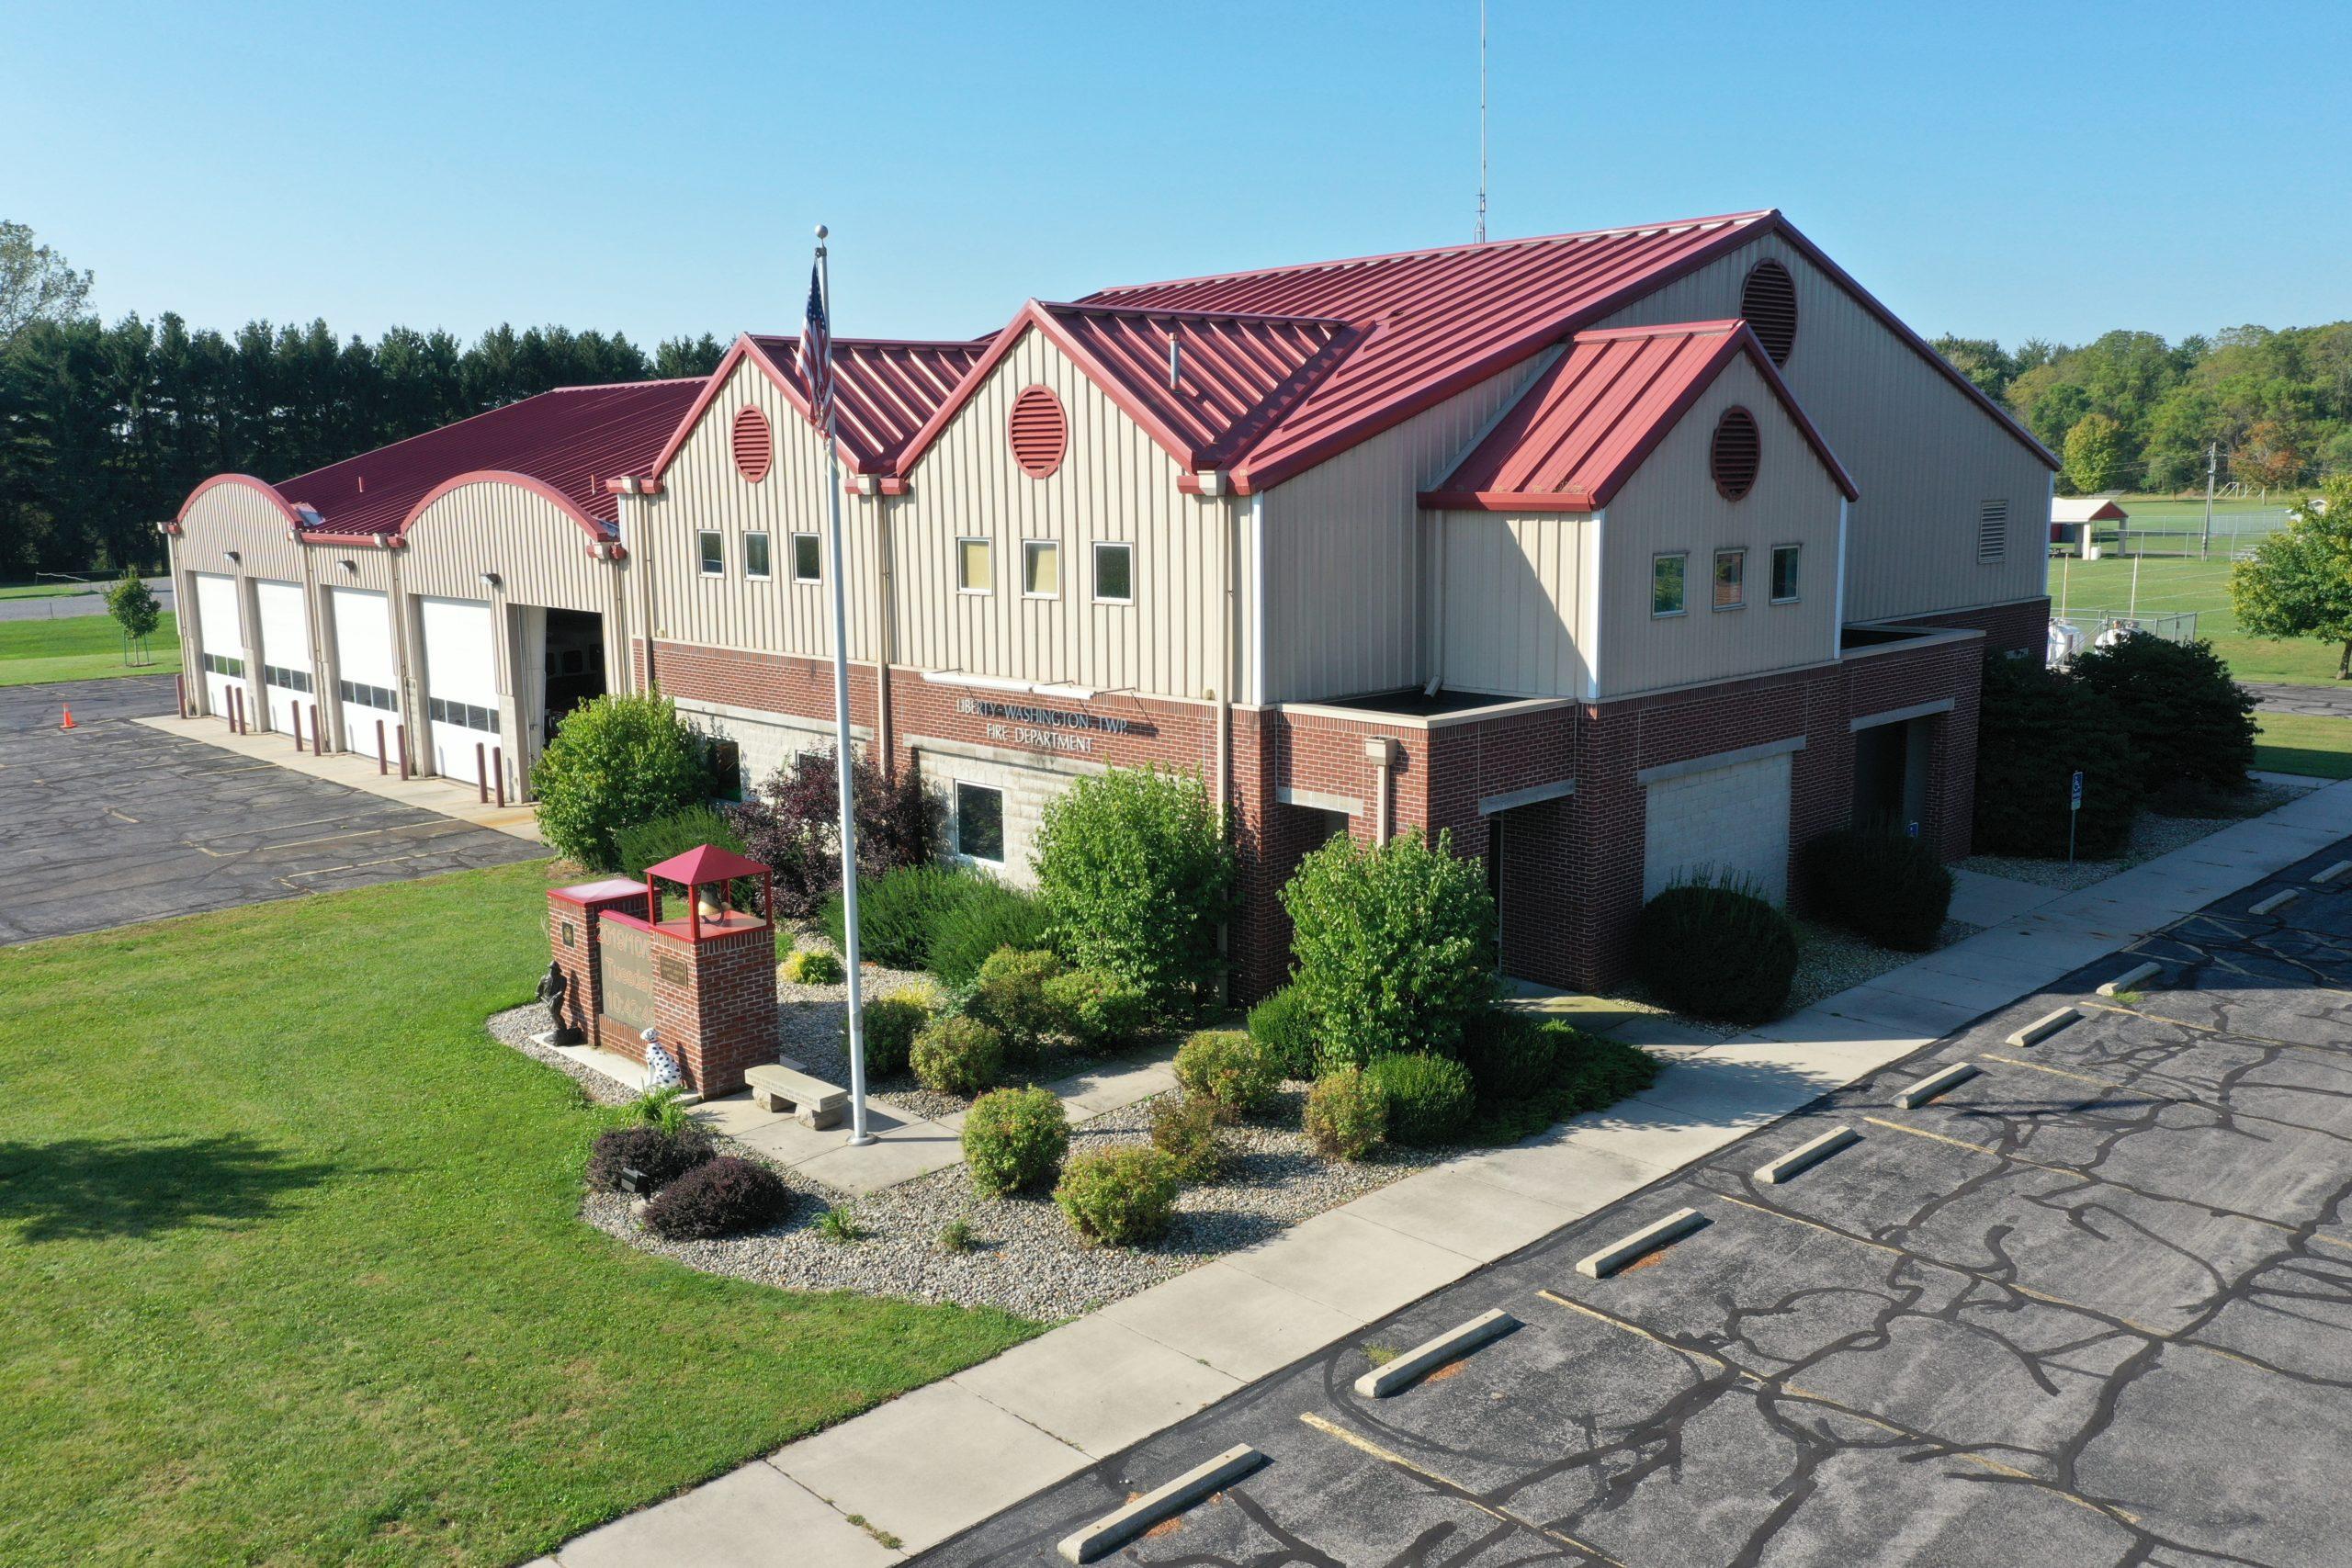 Liberty-Washington Township Fire Station – Liberty Center, Ohio